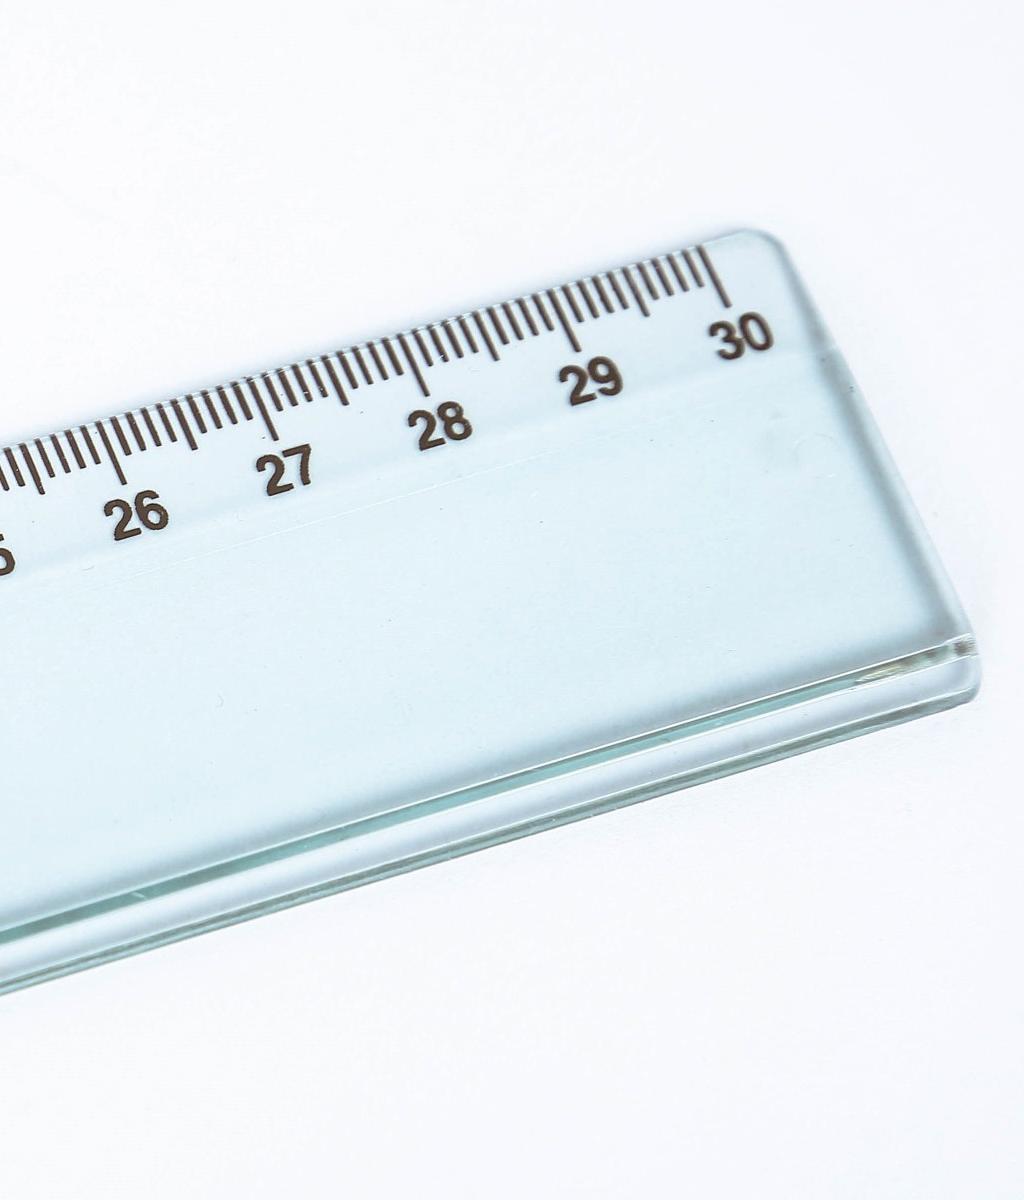 Règle plate 30 cm RP 30